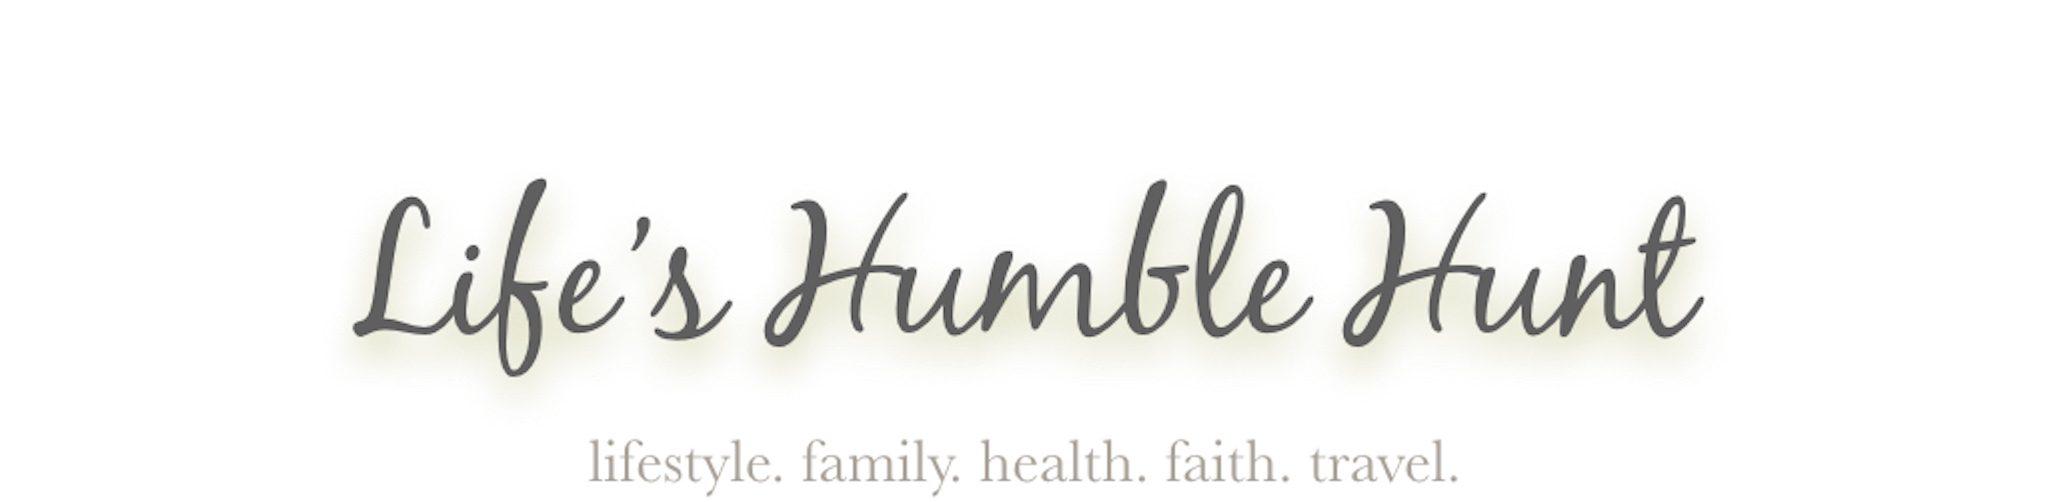 Life's Humble Hunt